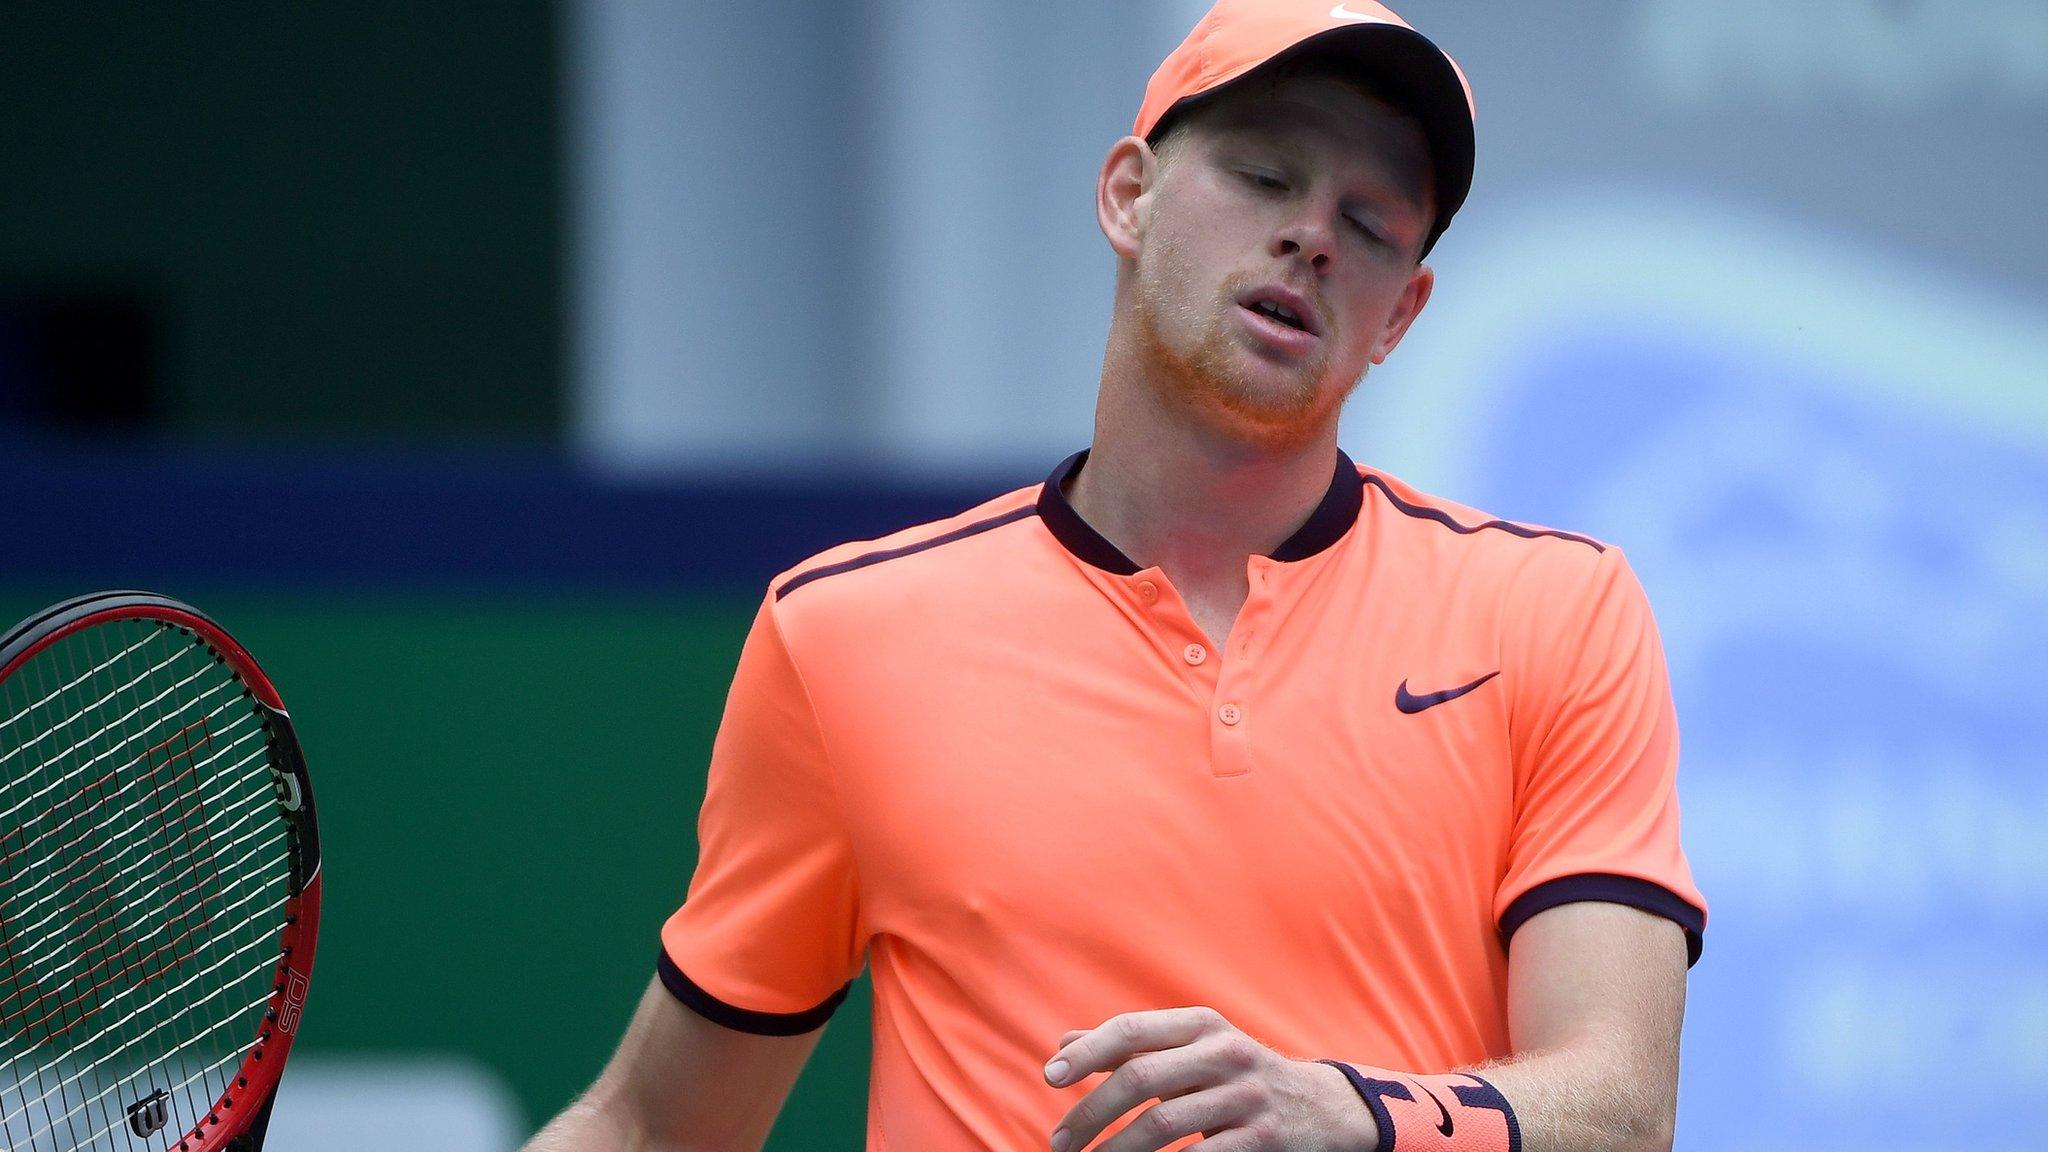 Edmund retires from Ferrer match after 18 minutes